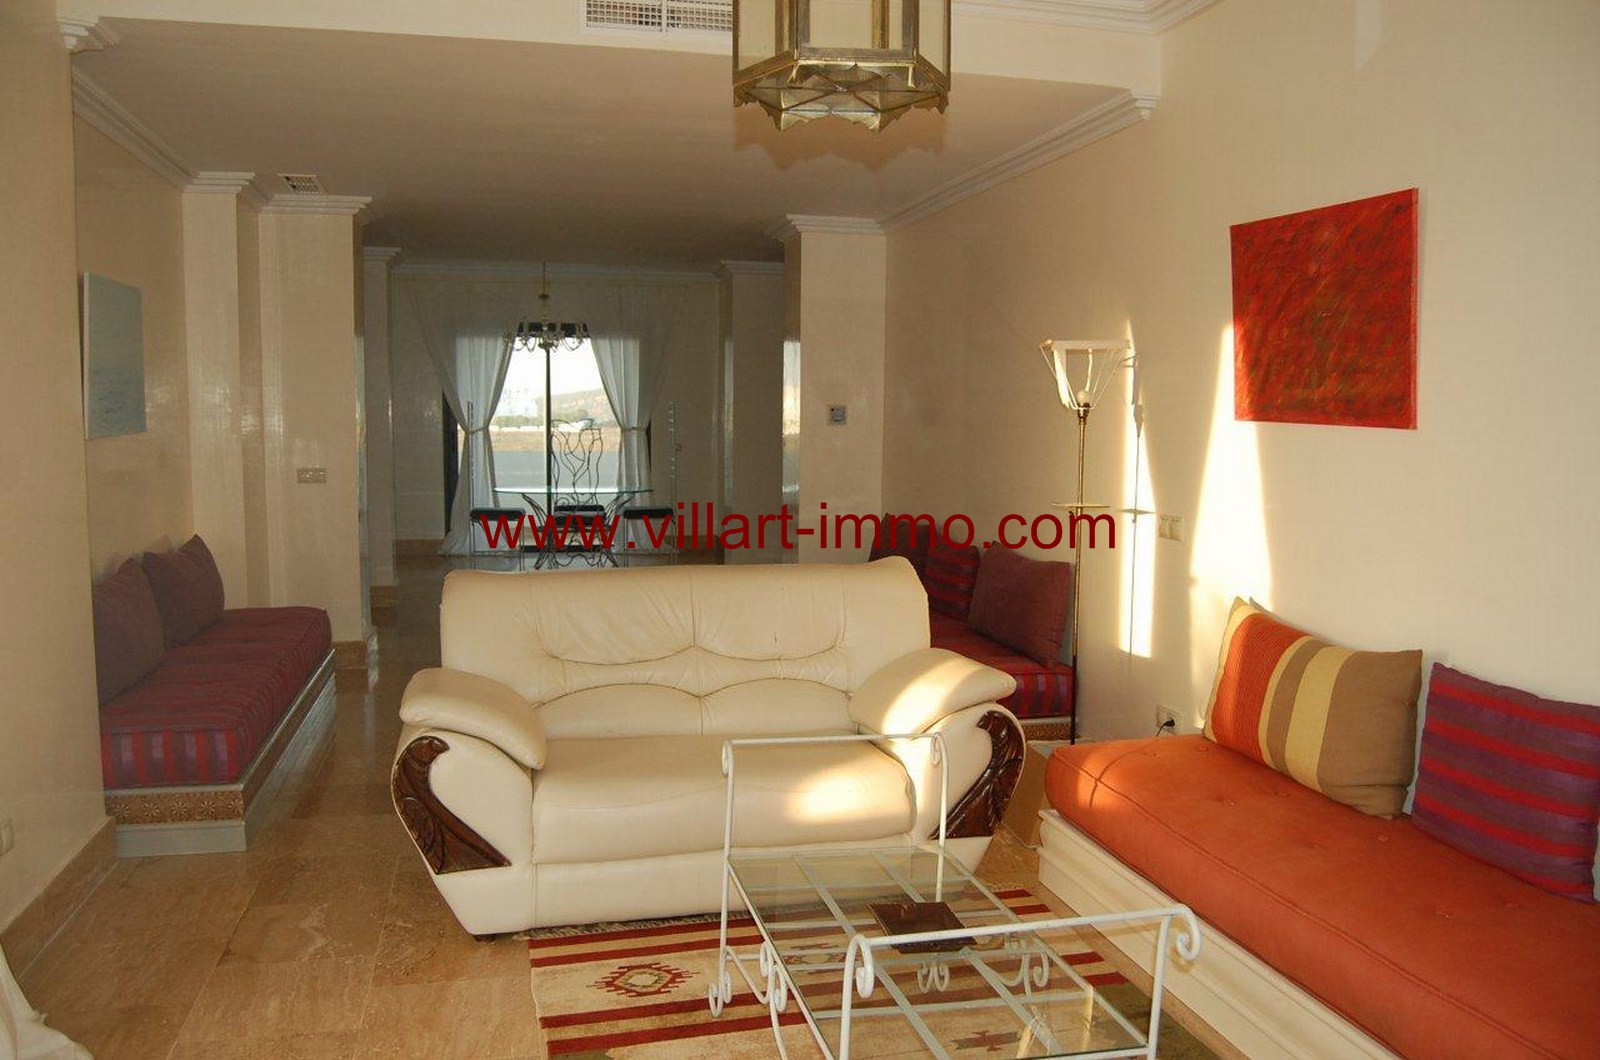 1-vente-appartement-tanger-achakar-salon-va391-villart-immo